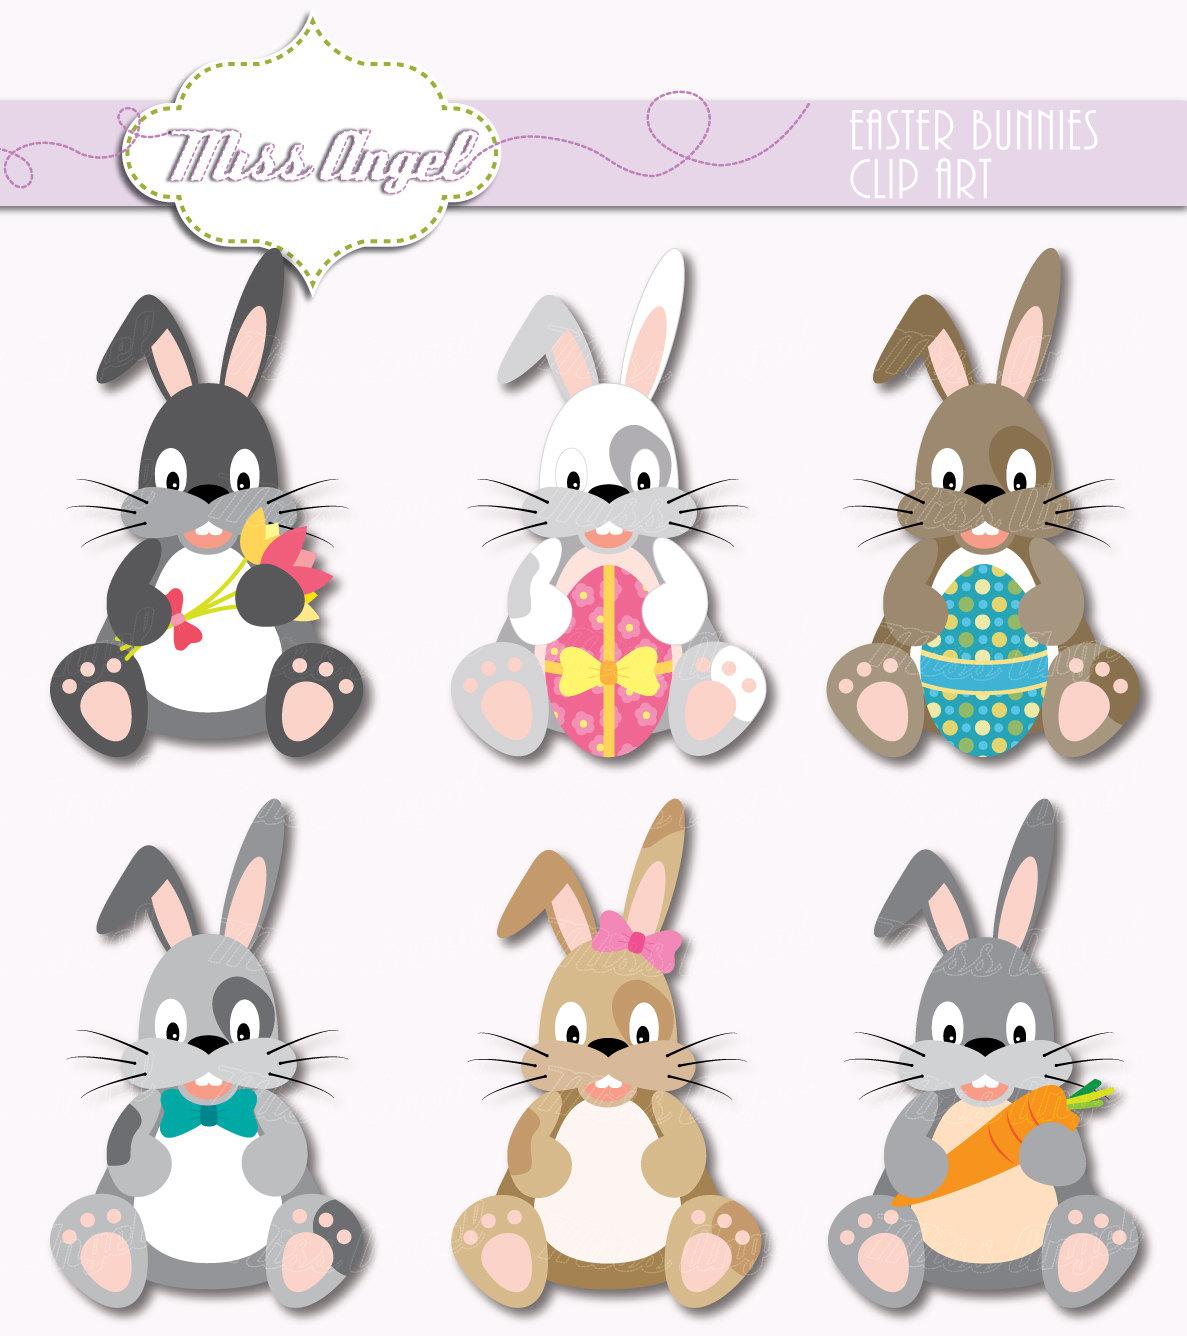 Easter bunnies grey rabbit. Bunny clipart printable